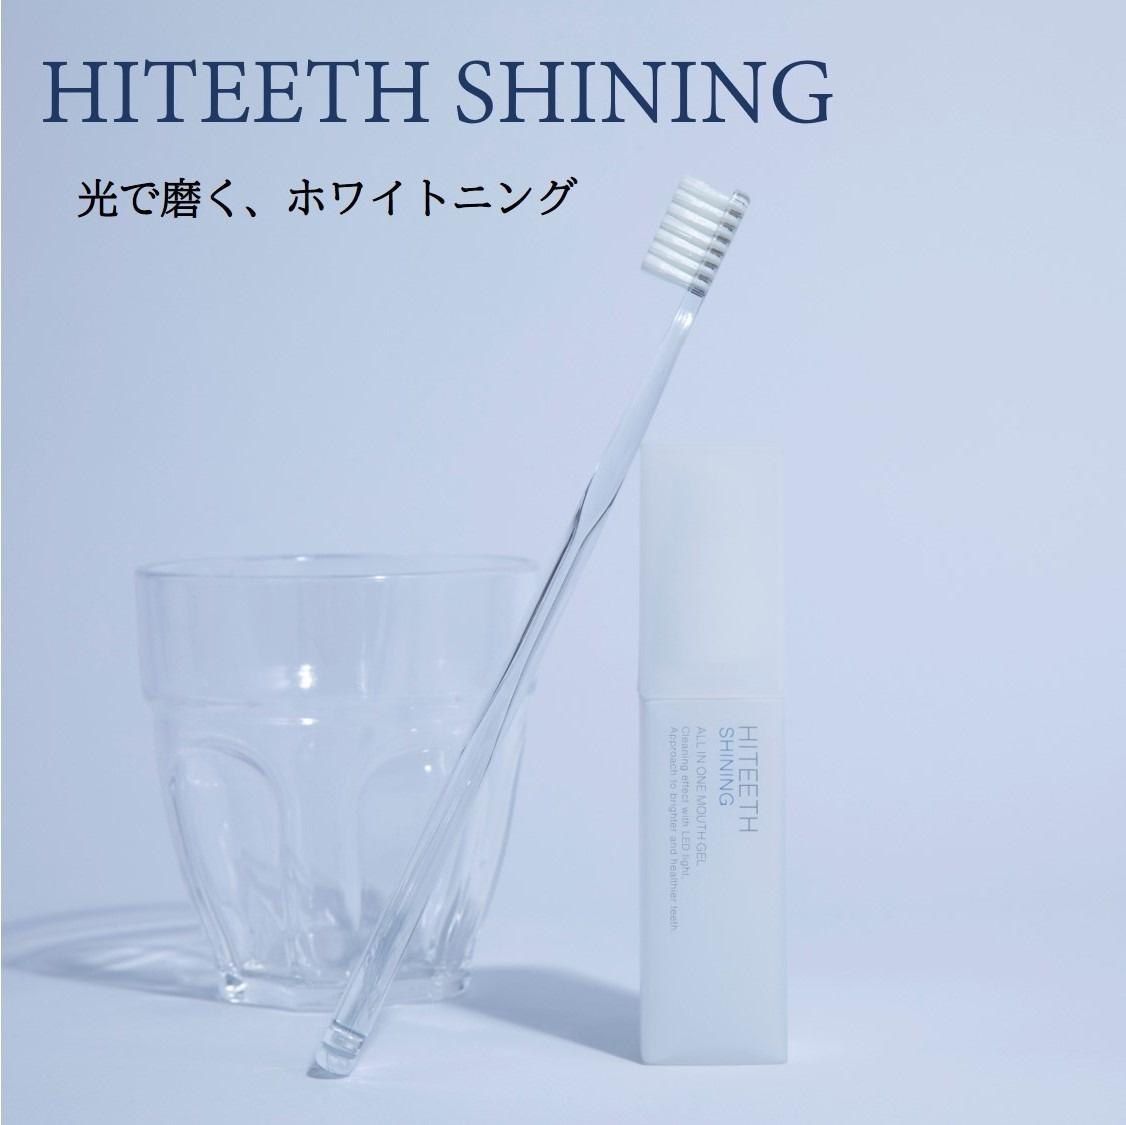 HITEETH SHININGが紹介されました!